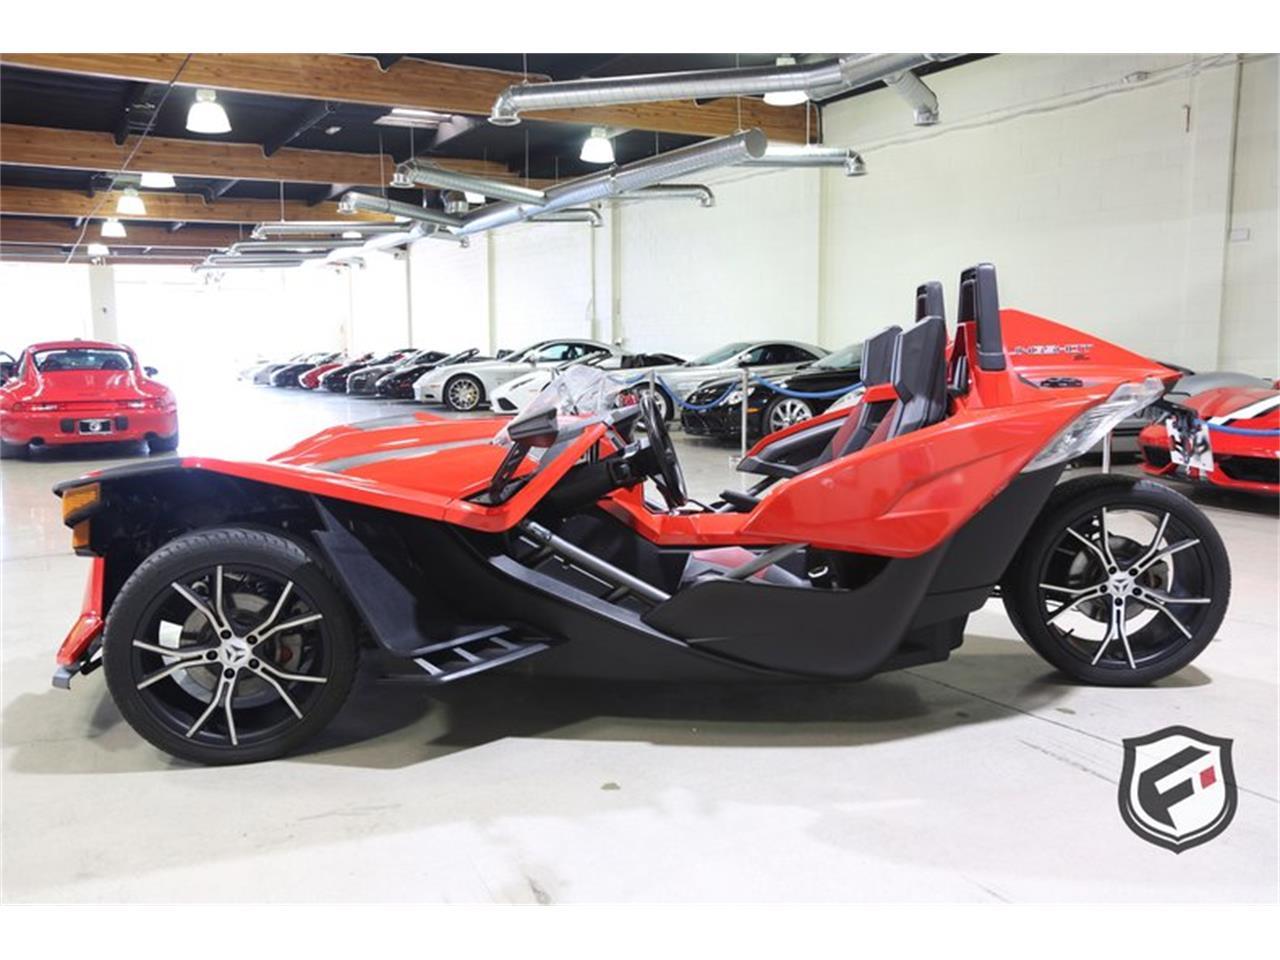 2015 Polaris Slingshot (CC-1331549) for sale in Chatsworth, California